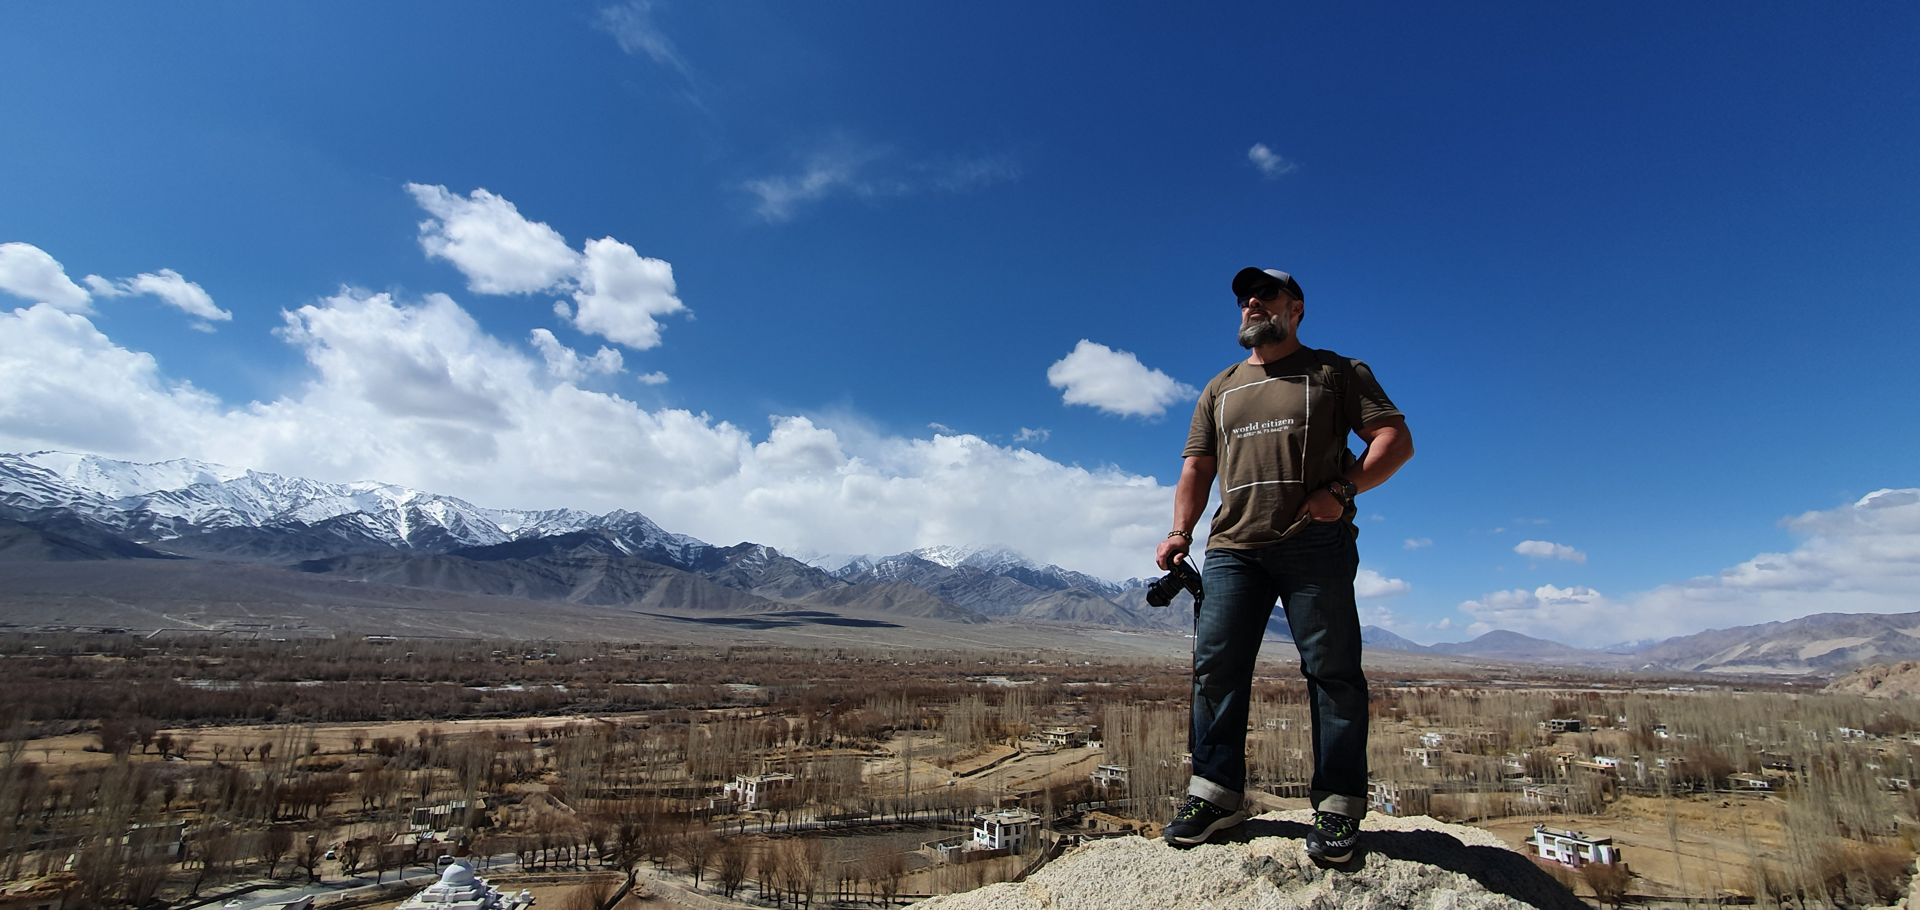 Merrell-MTL-Long-Sky-travel-photography-Leh-Ladakh-Himalayas-India-Nathan-Brayshaw